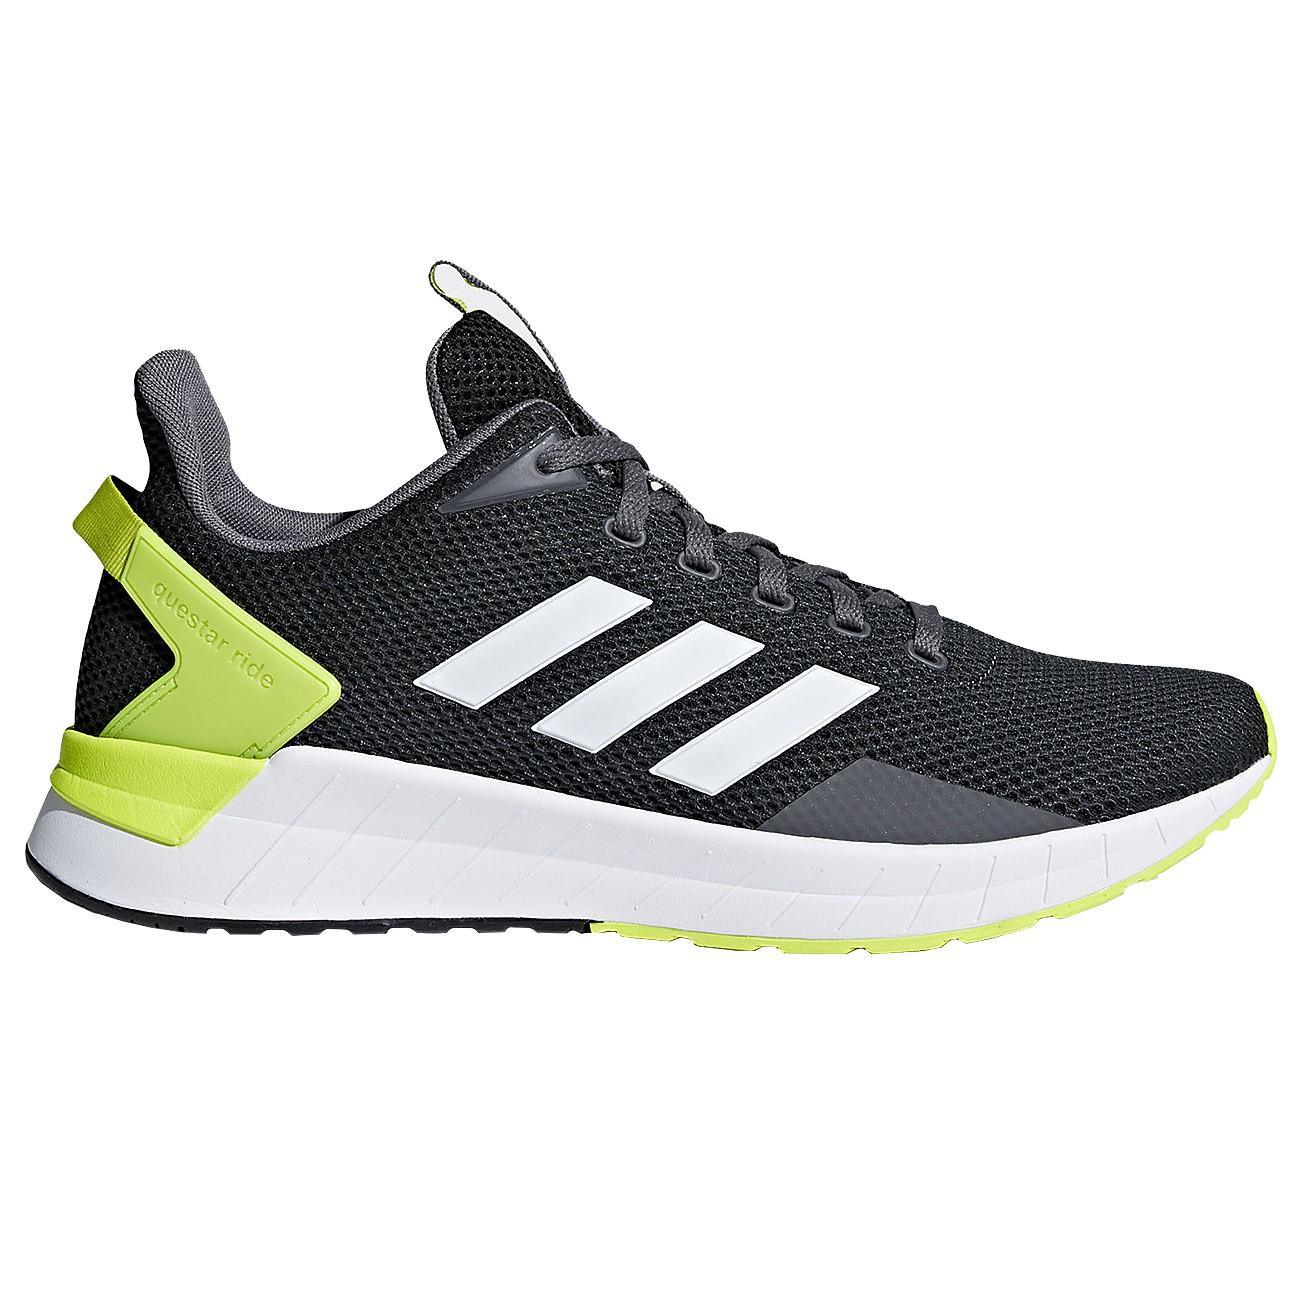 new arrival 66c17 39bb3 Running shoes Adidas Questar Ride Man grey-yellow